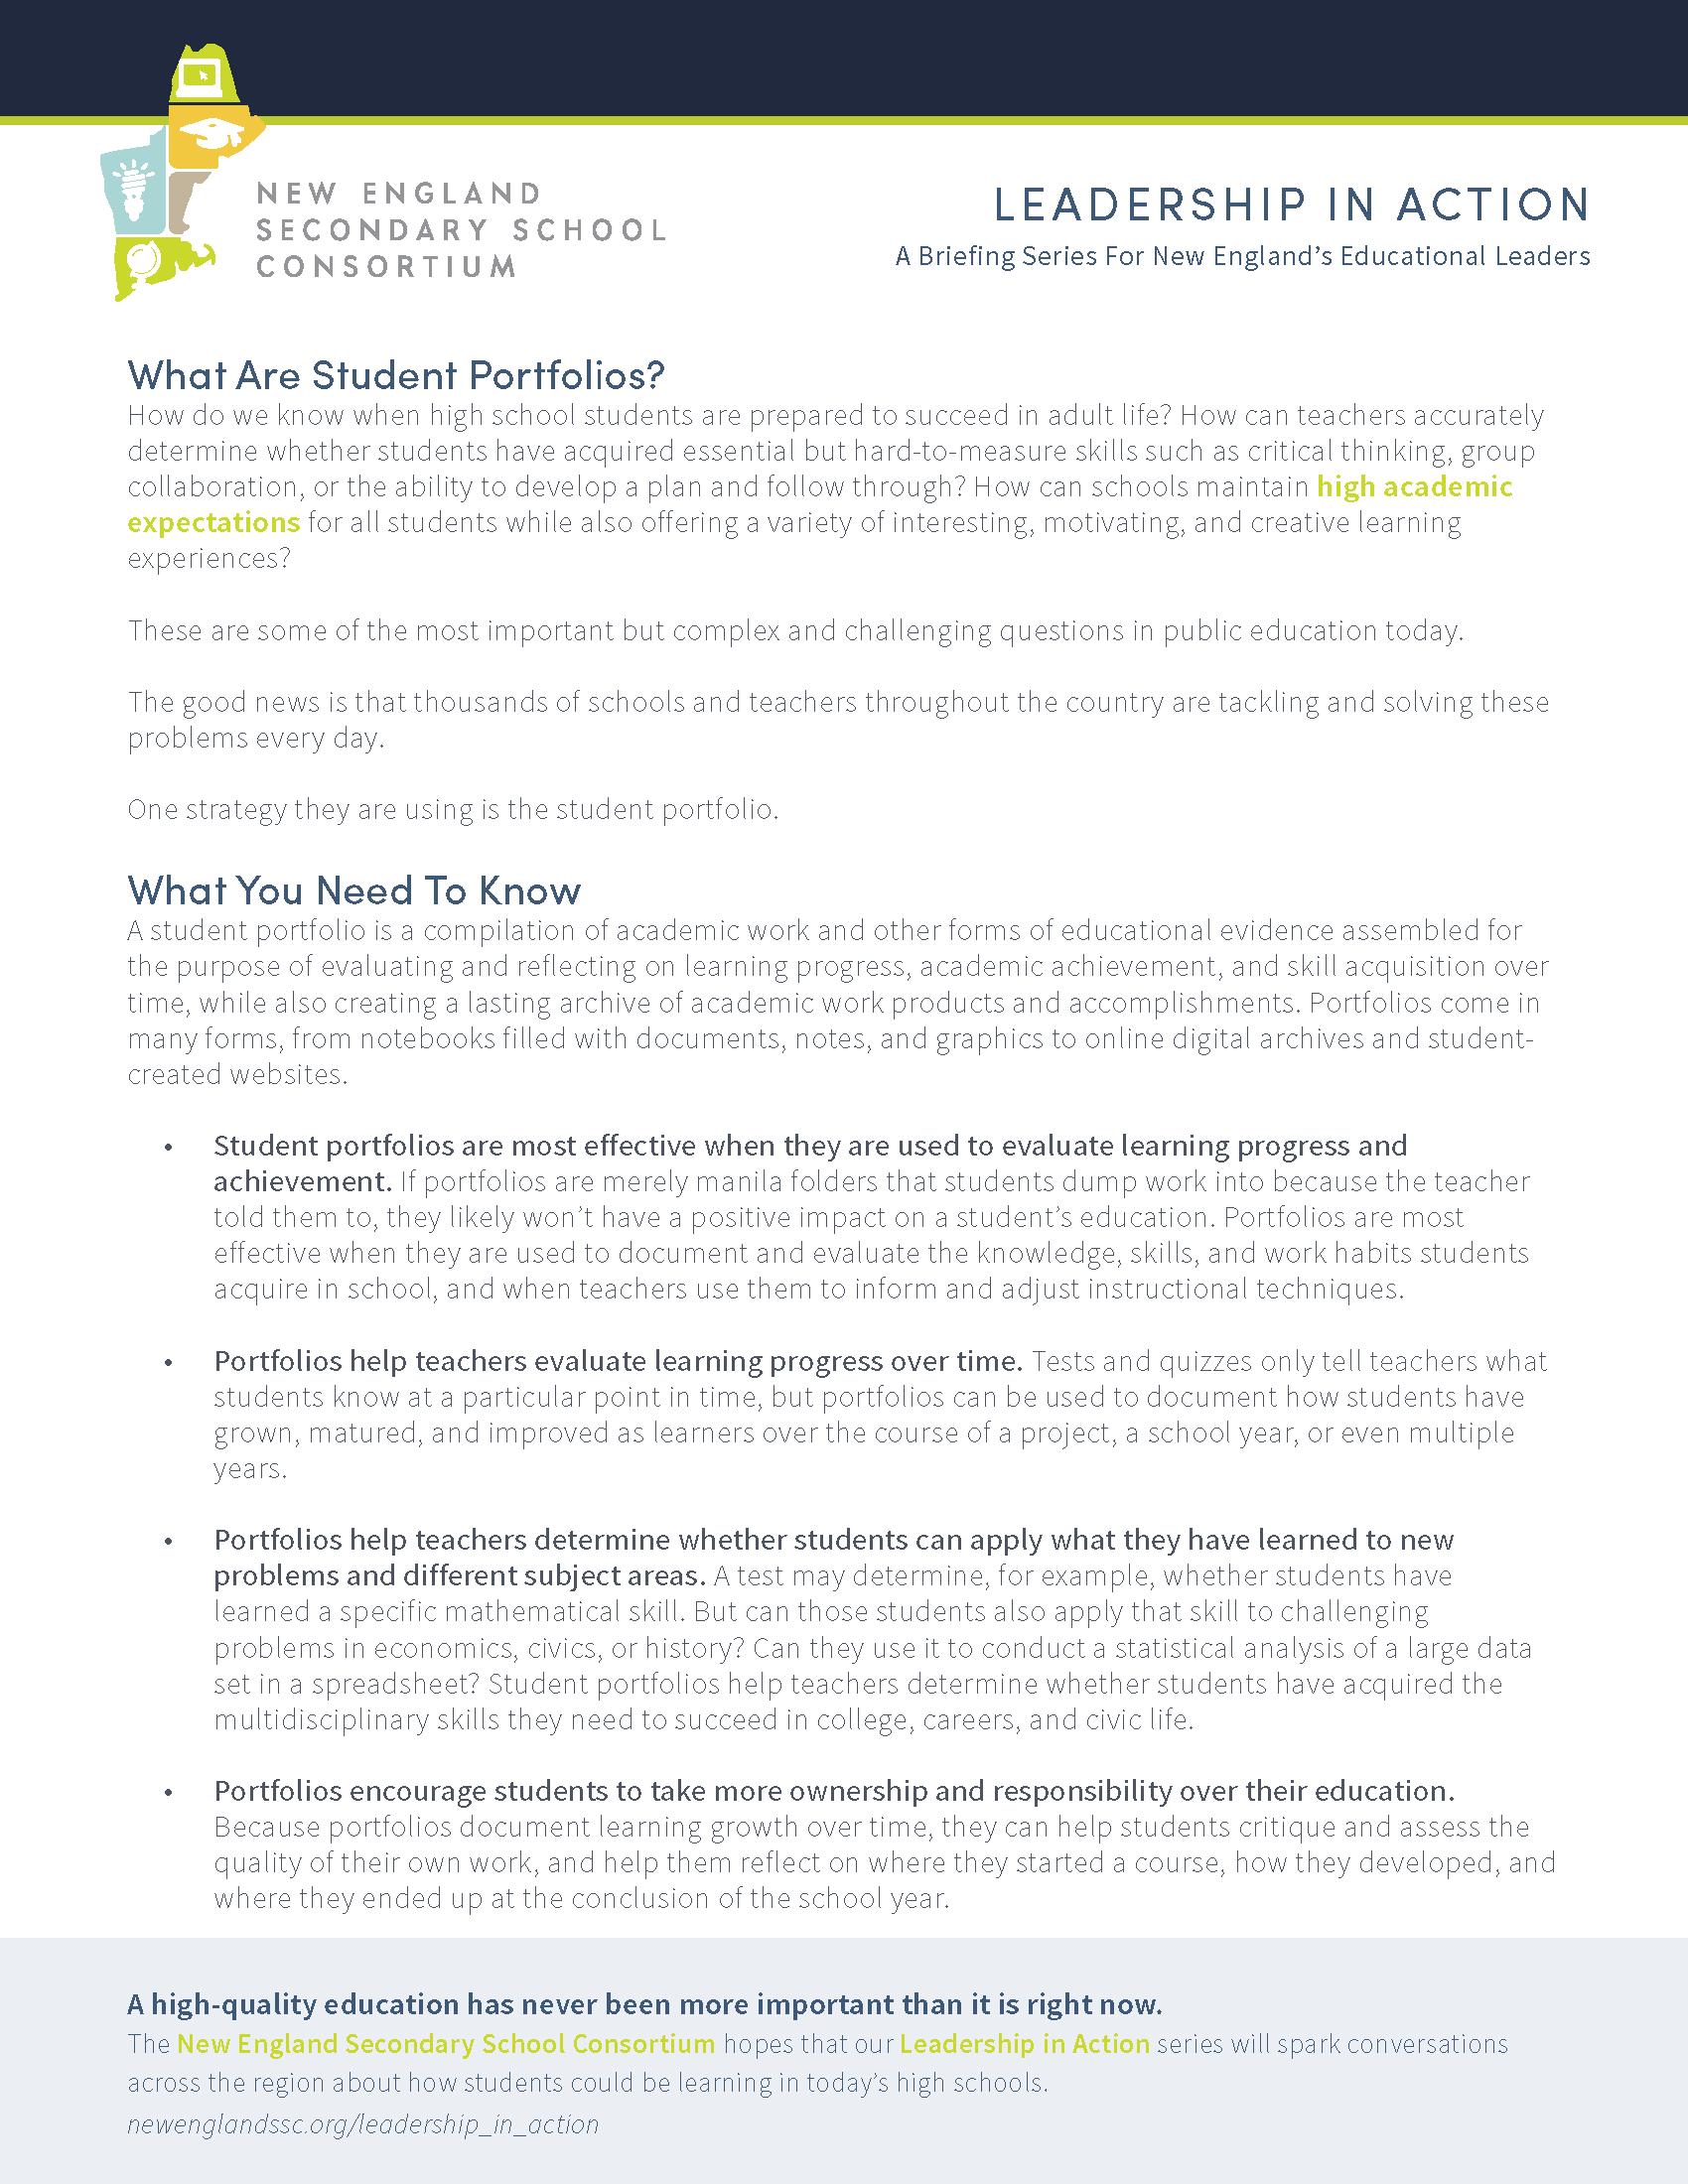 Leadership in Action | Great Schools Partnership